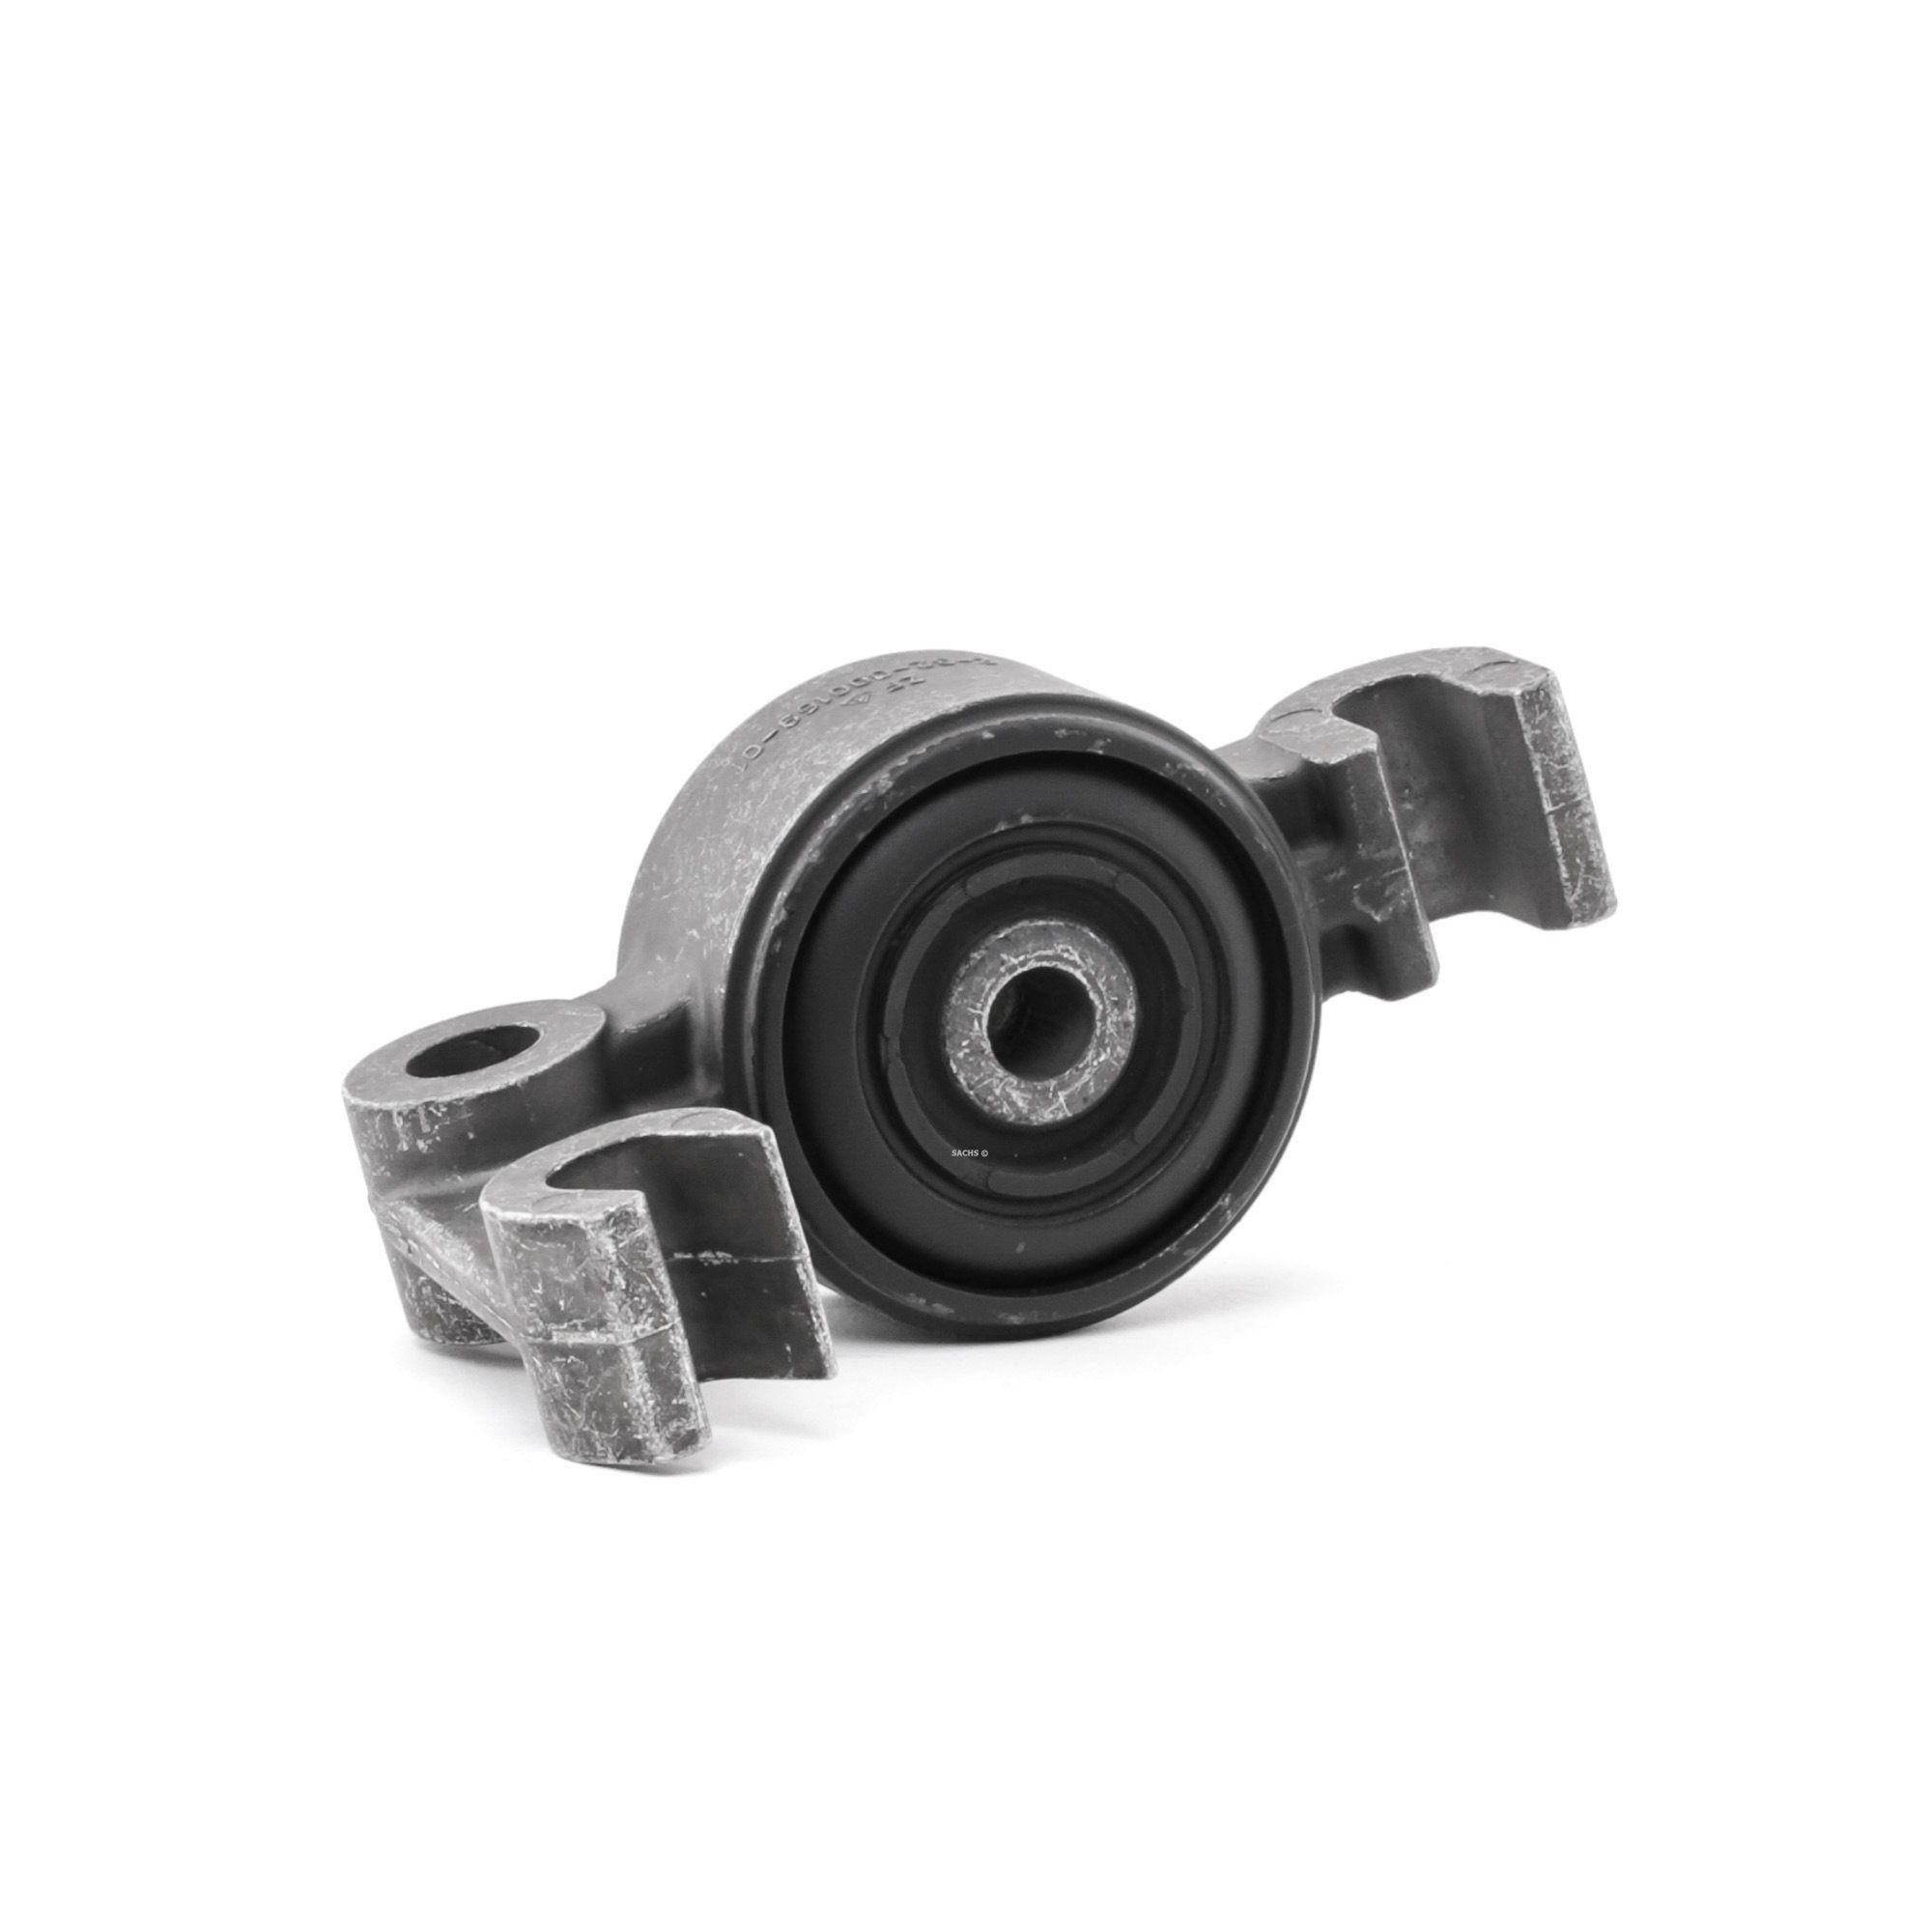 802 331 SACHS Rear Axle Top Strut Mounting 802 331 cheap